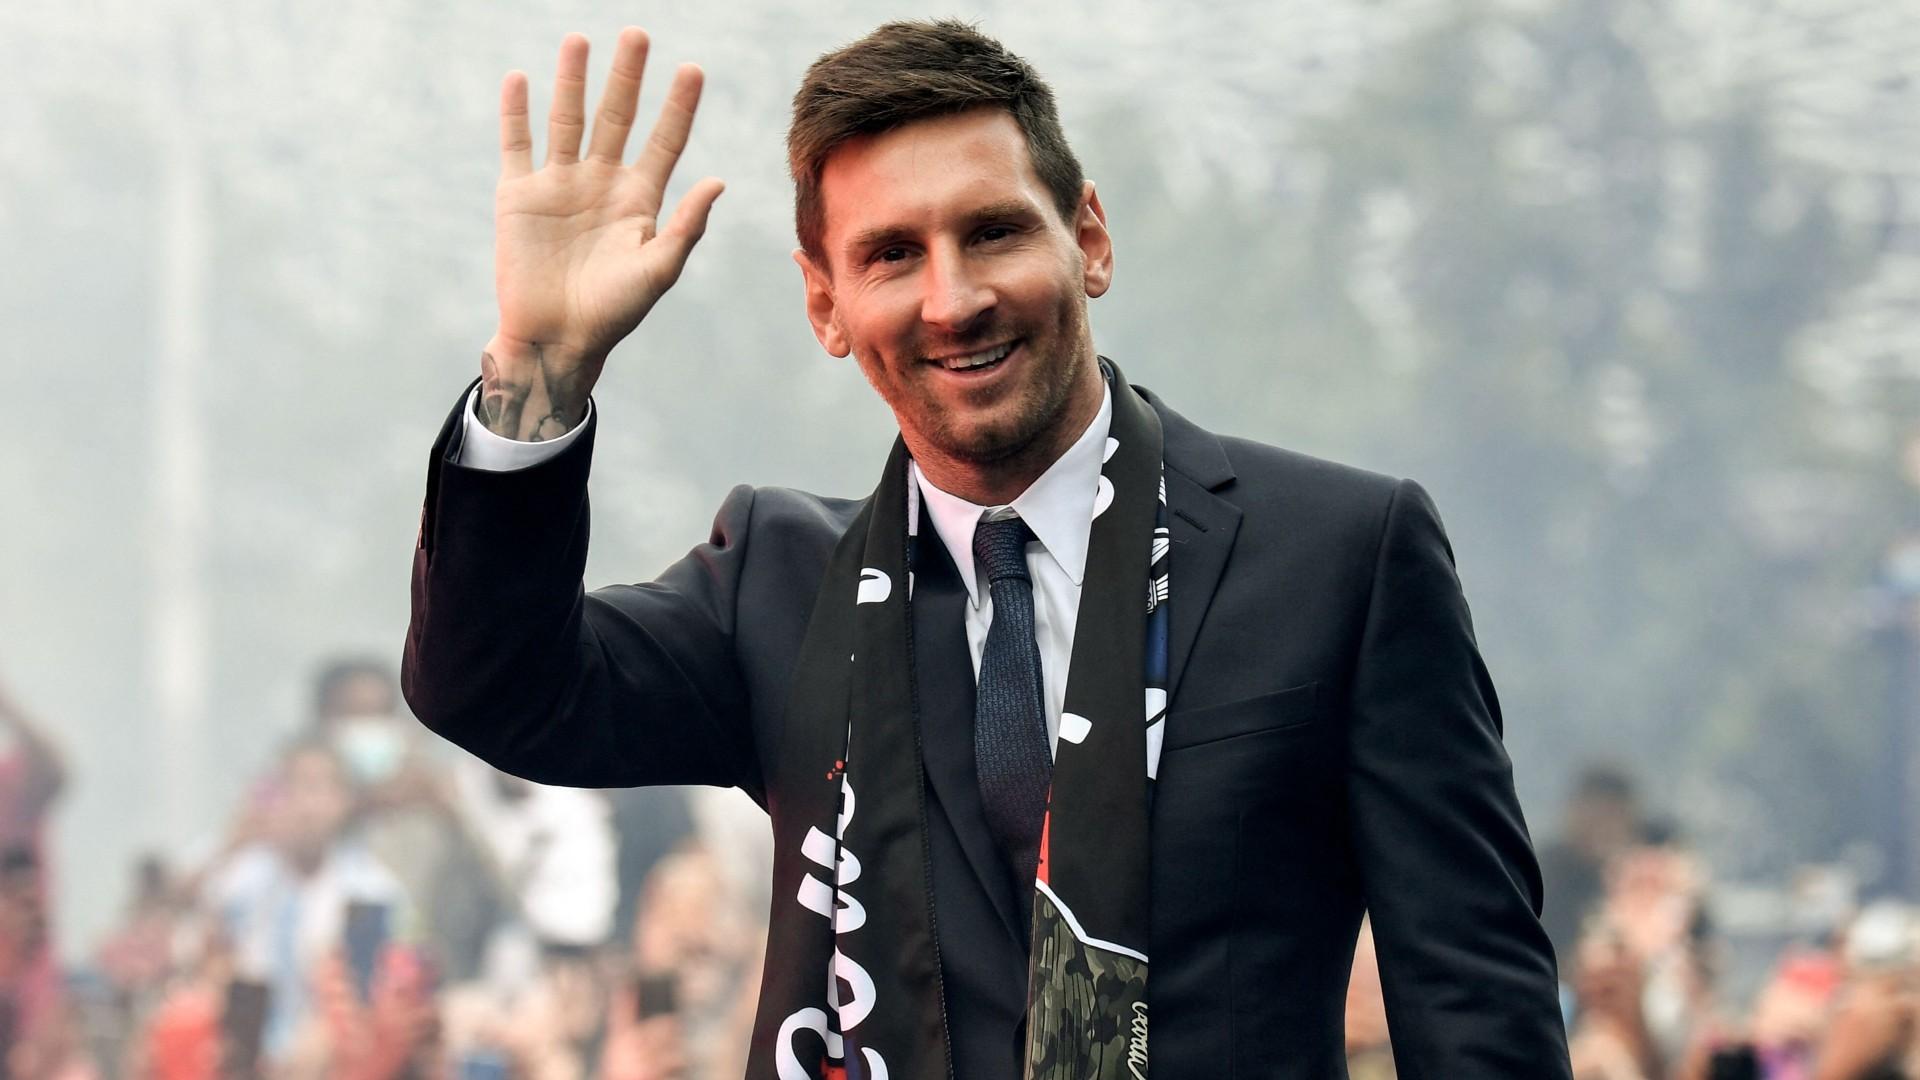 Super Eagles legend Okocha welcomes Messi to PSG